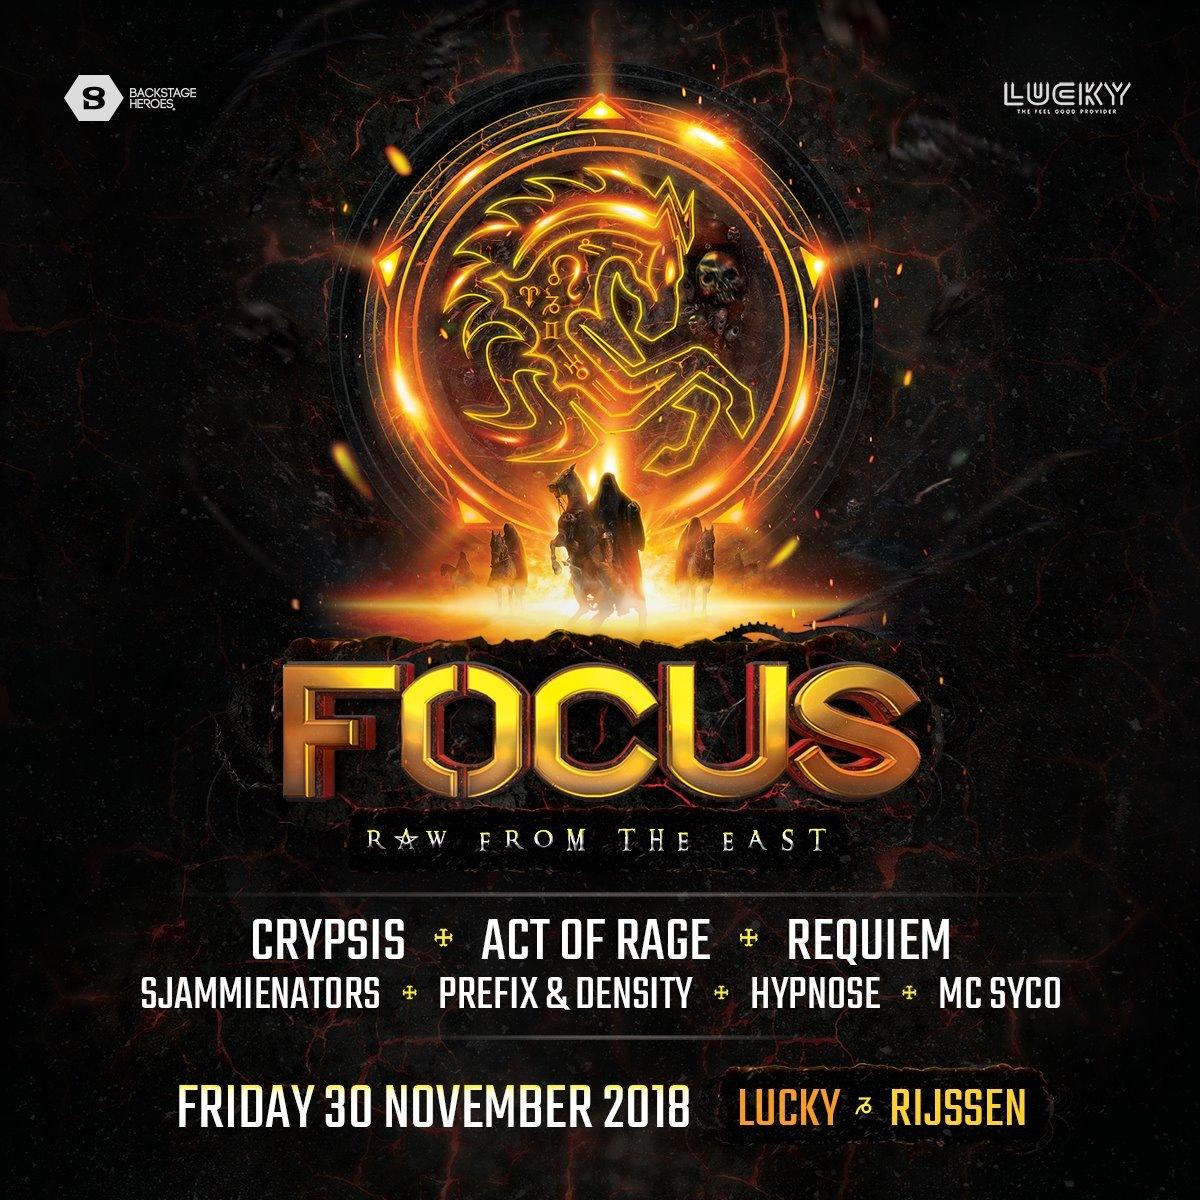 East Orange Focus >> Focus Tickets Line Up Timetable Info